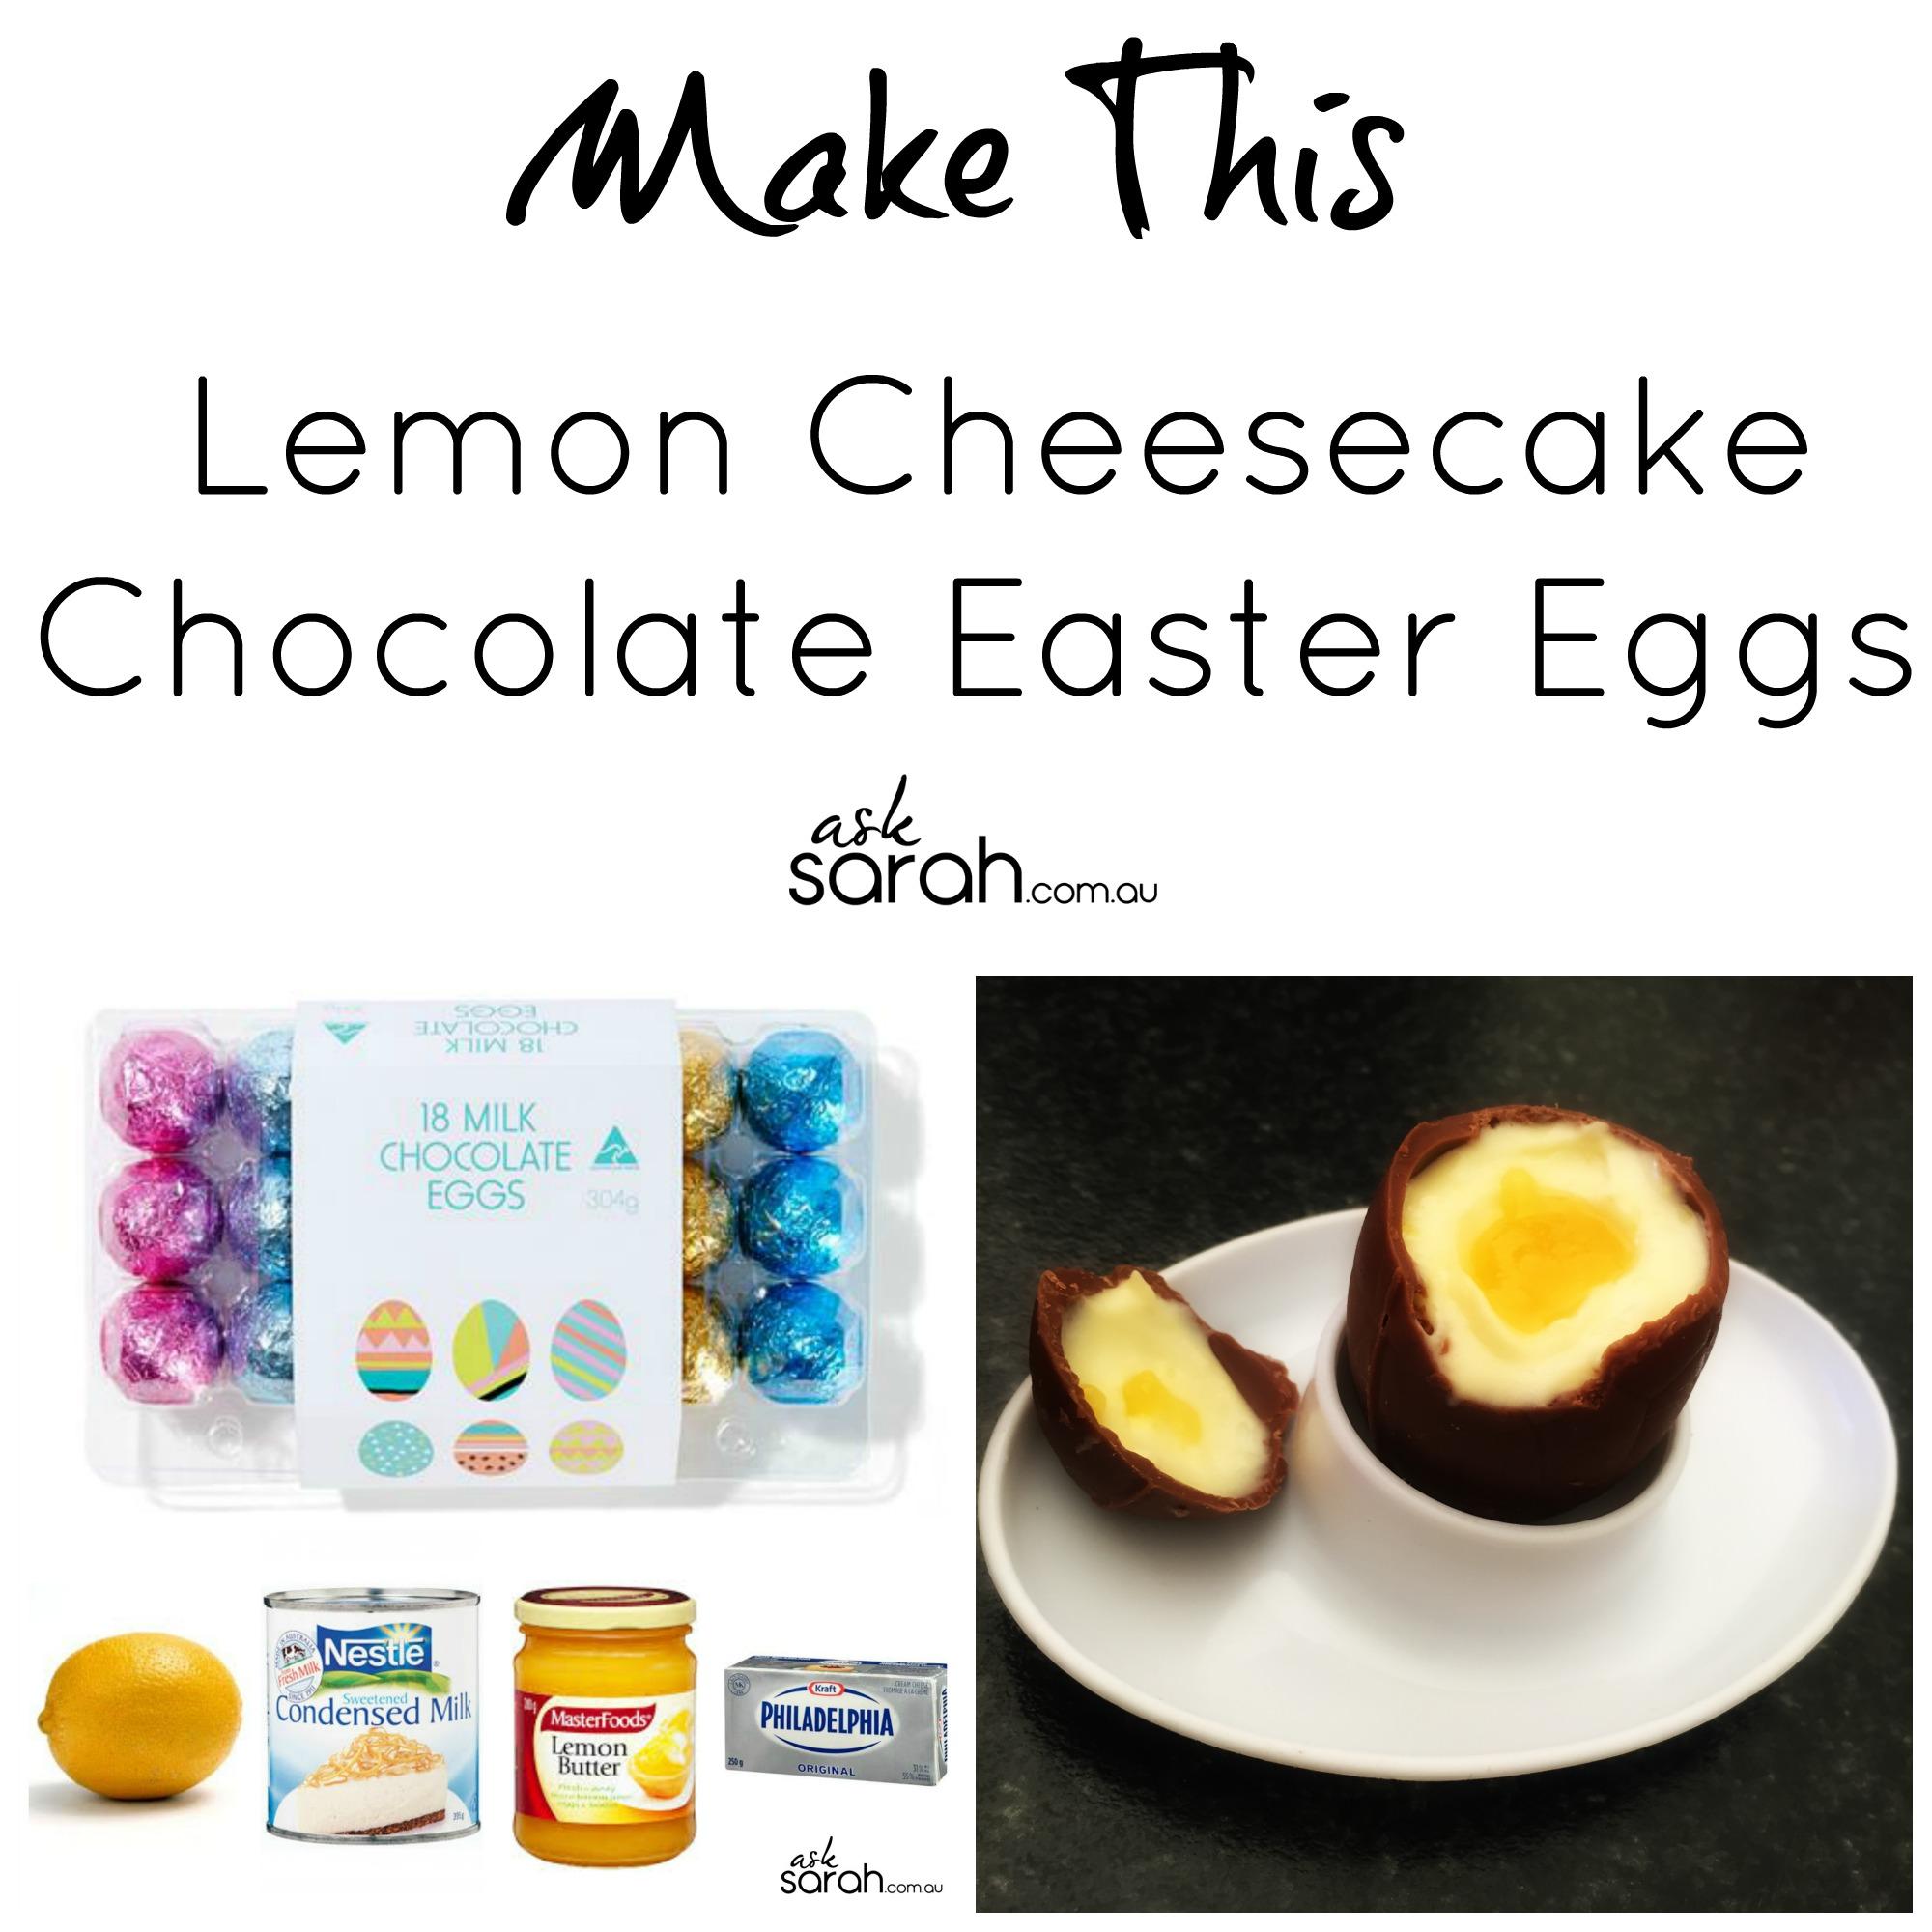 Recipe: Lemon Cheesecake Chocolate Easter Eggs {Only 5 Ingredients & Easy Too!}